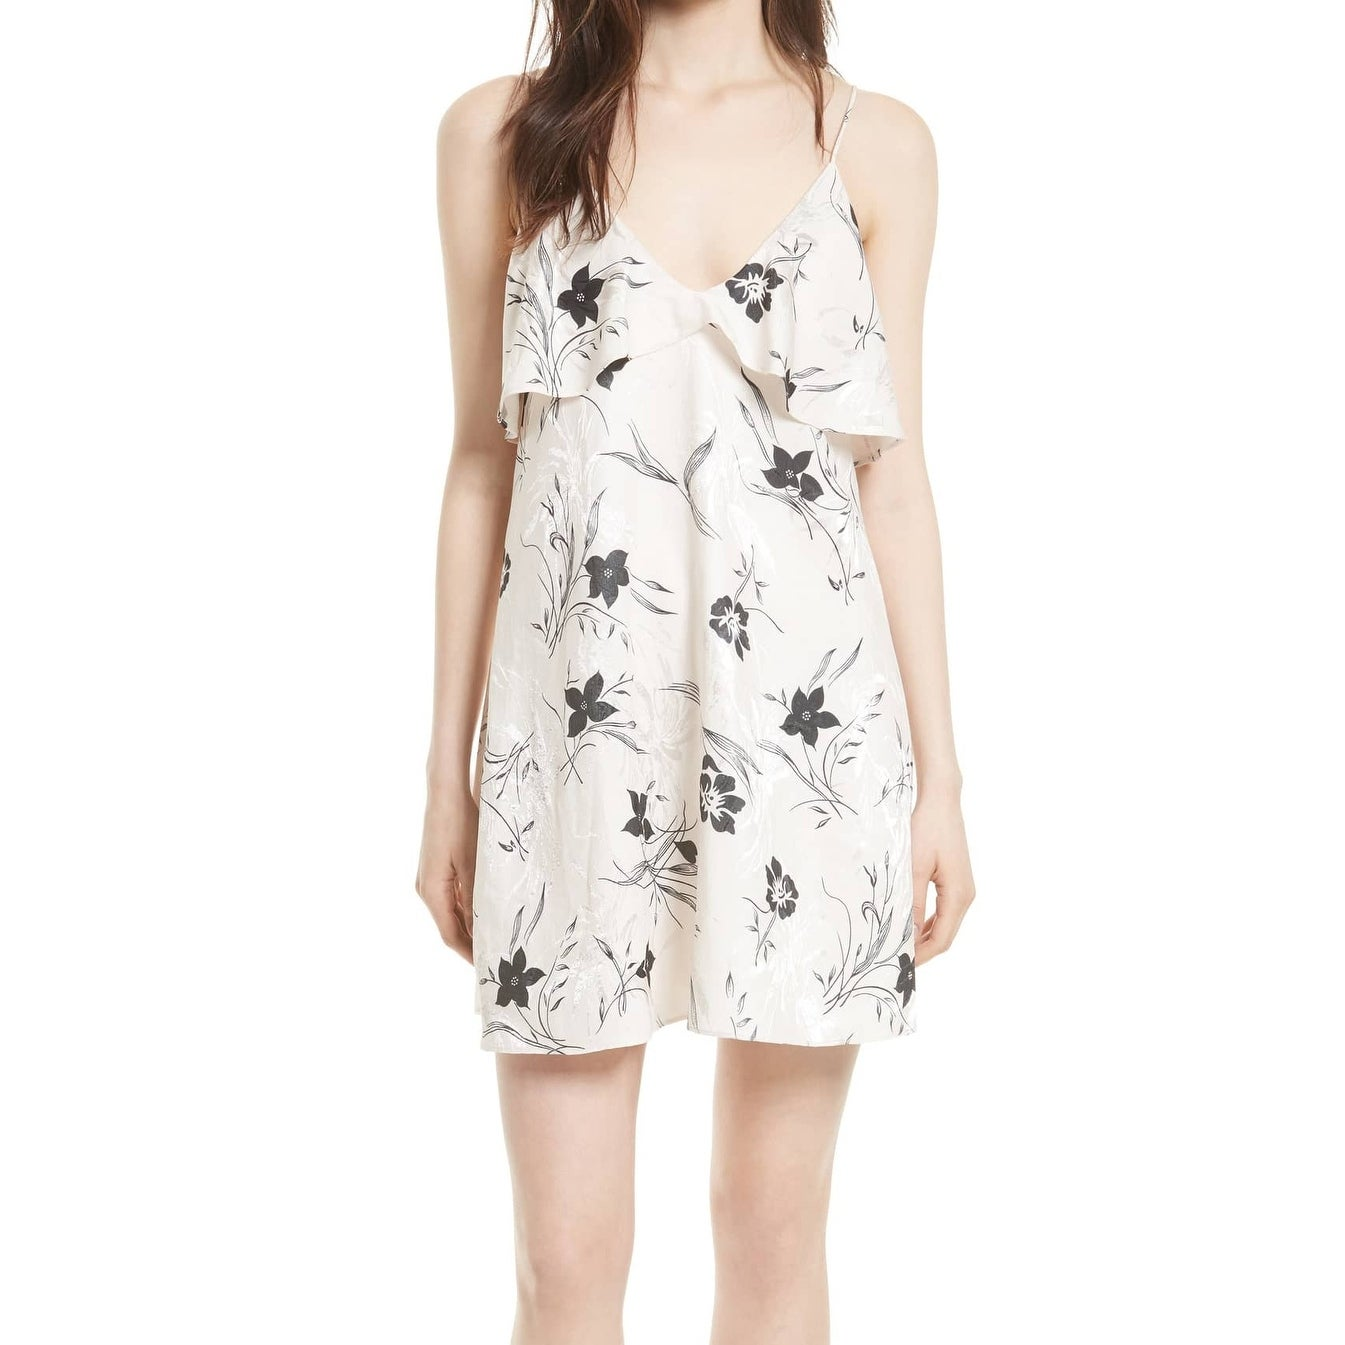 98ccb376f826 Shop Alice + Olivia Womens Large Floral-Print Slip Dress - Free ...